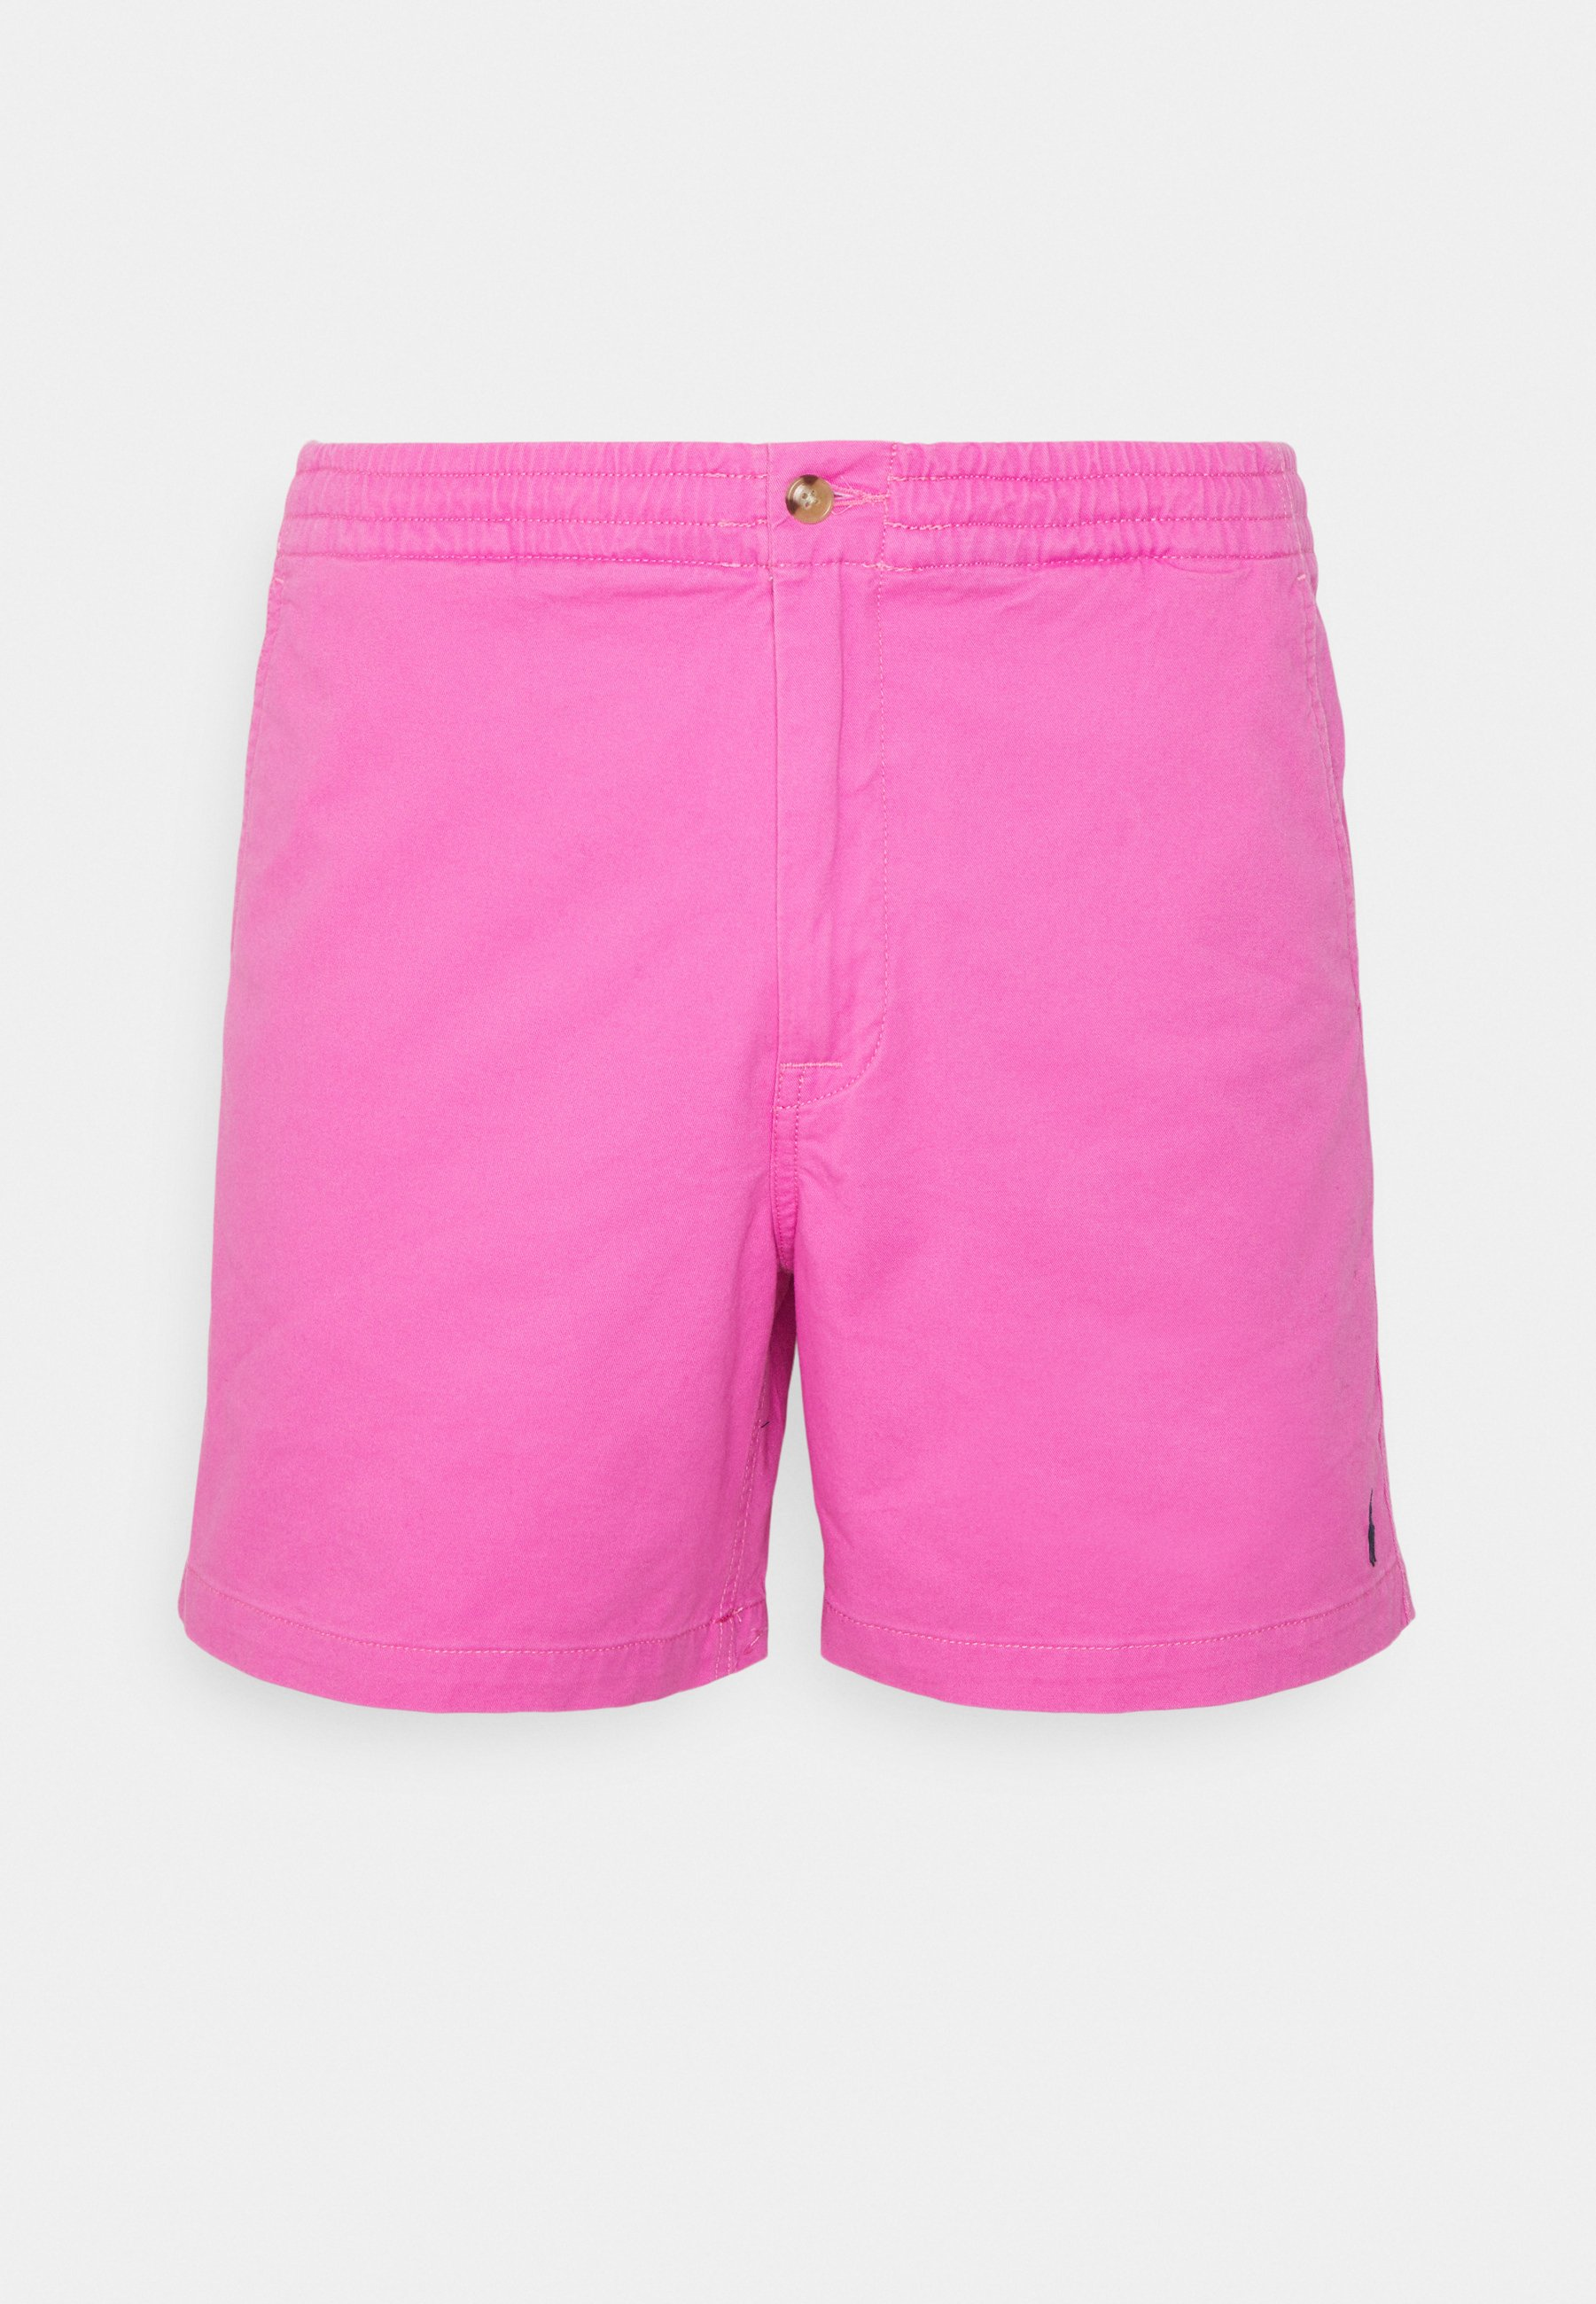 Uomo 6-INCH POLO PREPSTER TWILL SHORT - Shorts